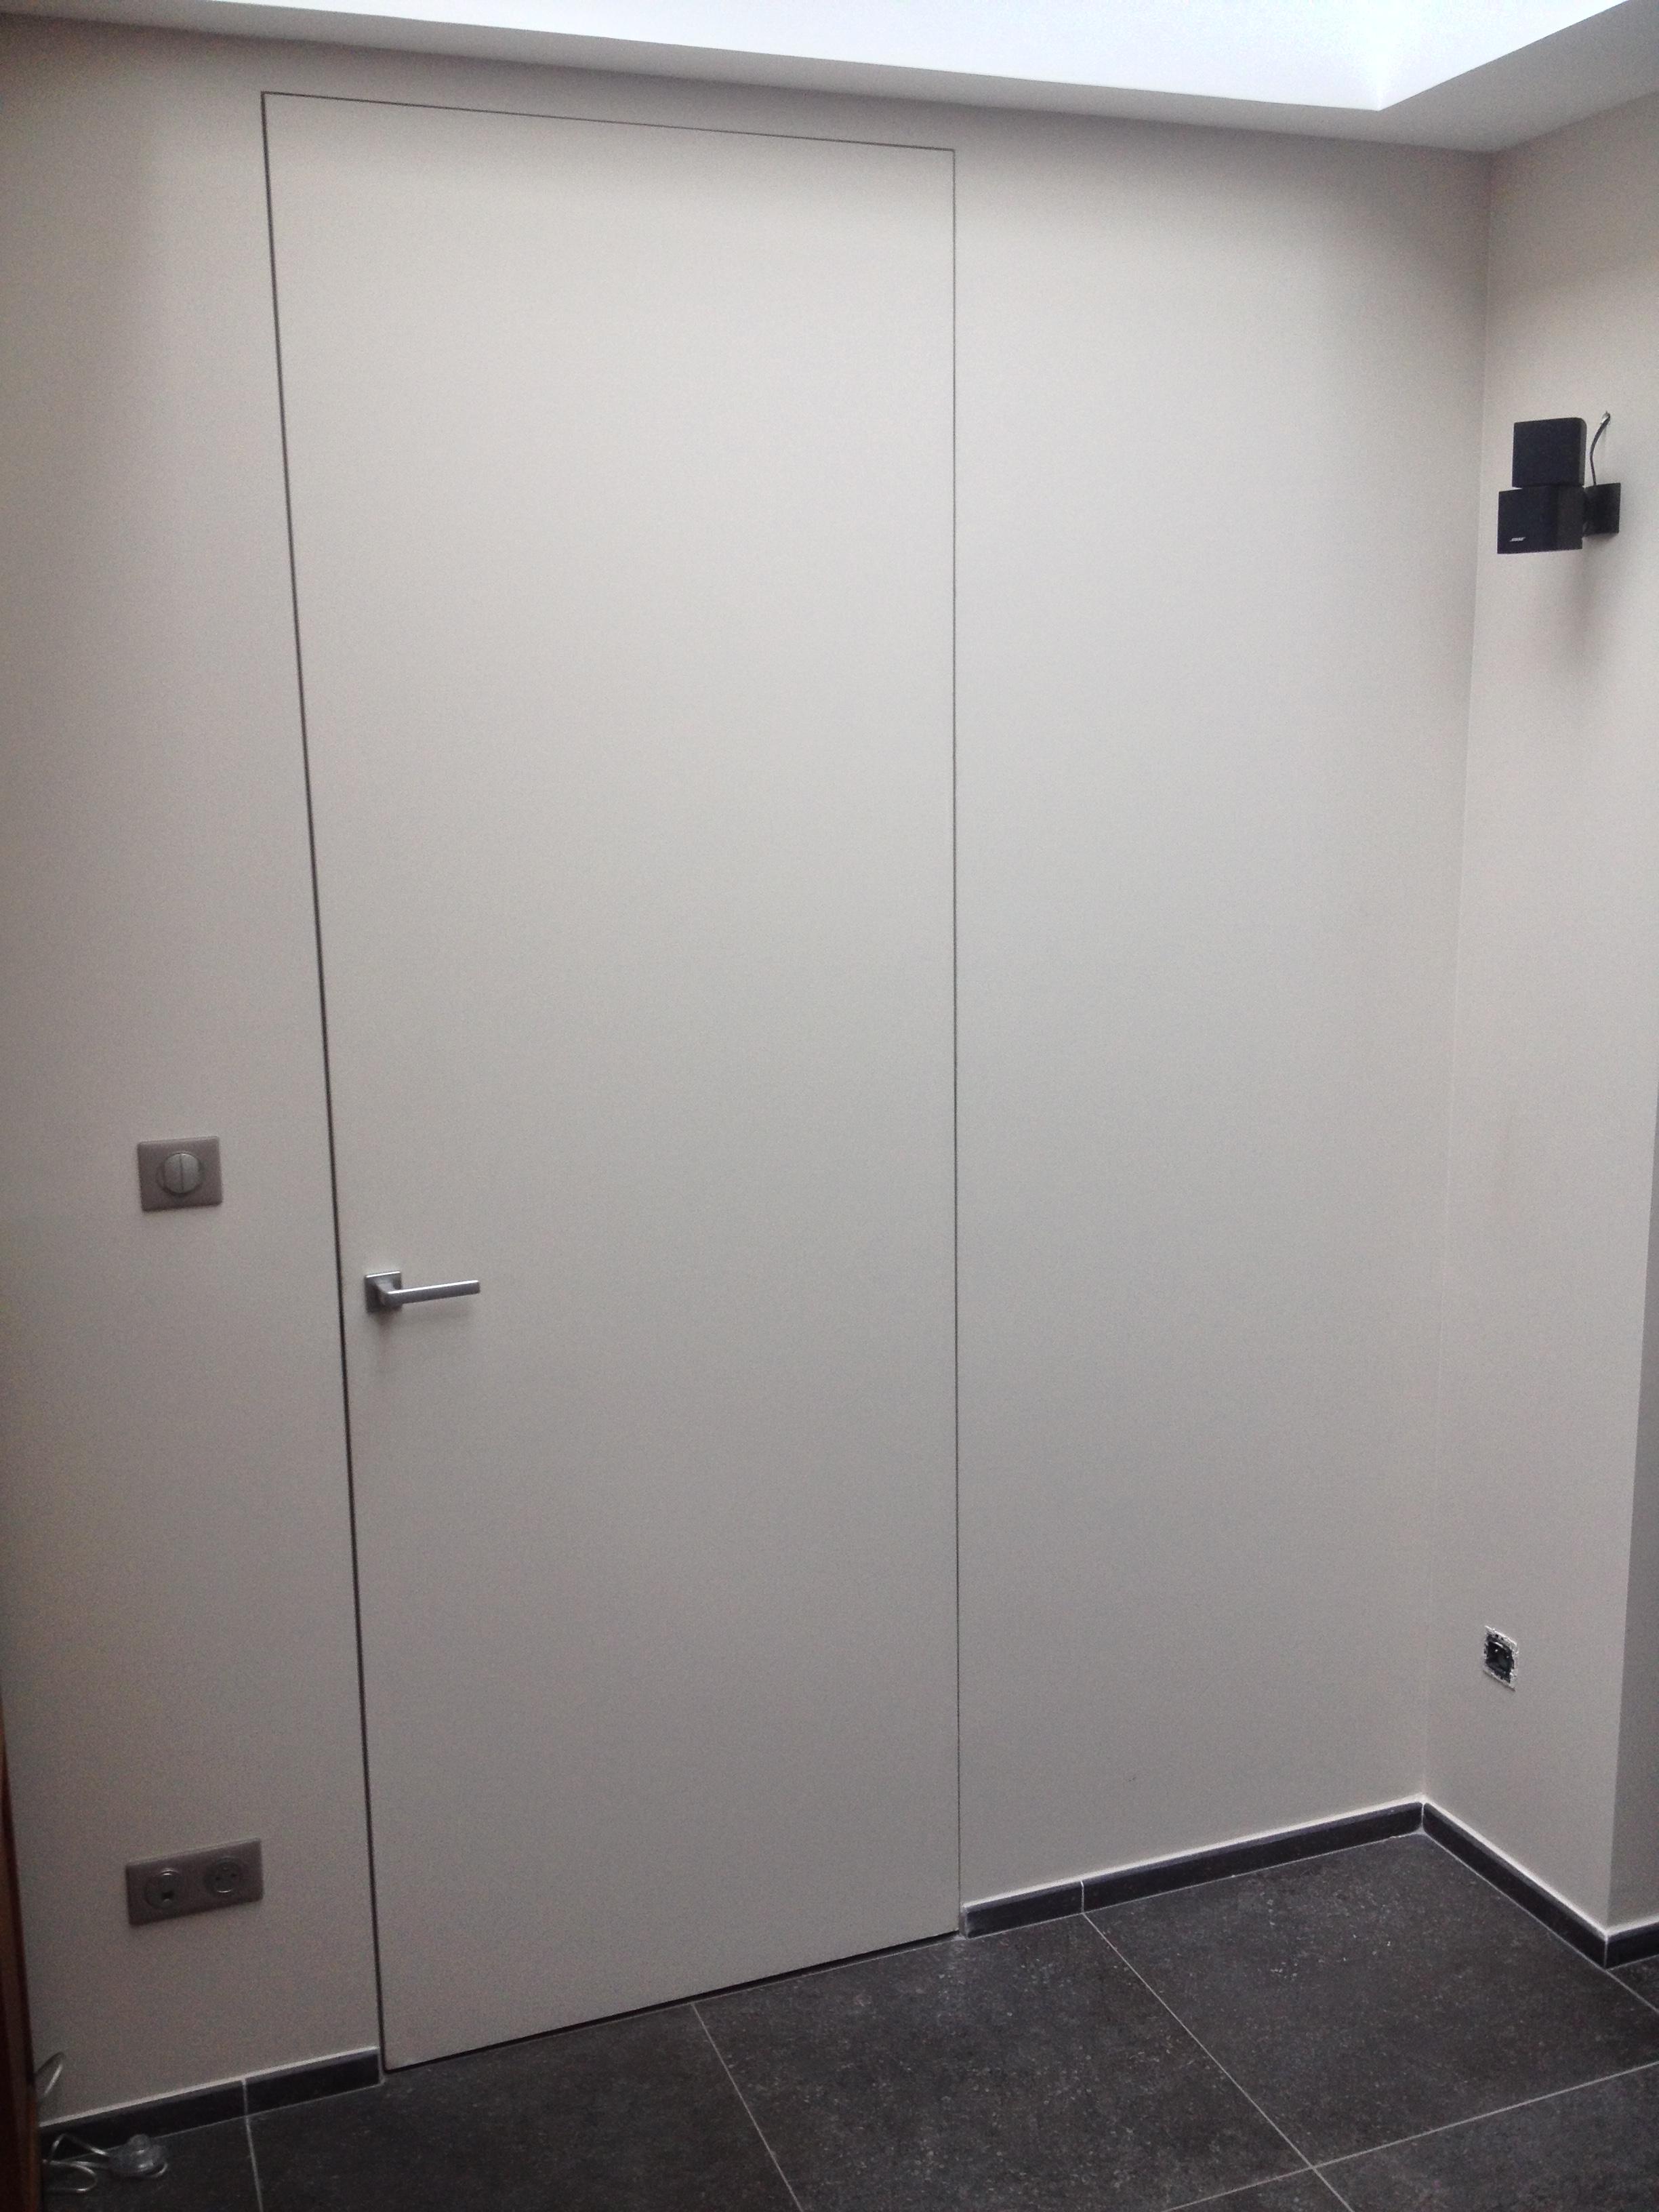 Porte d 39 int rieur 7 menuiserie delcour tourcoing for Menuiserie porte interieur